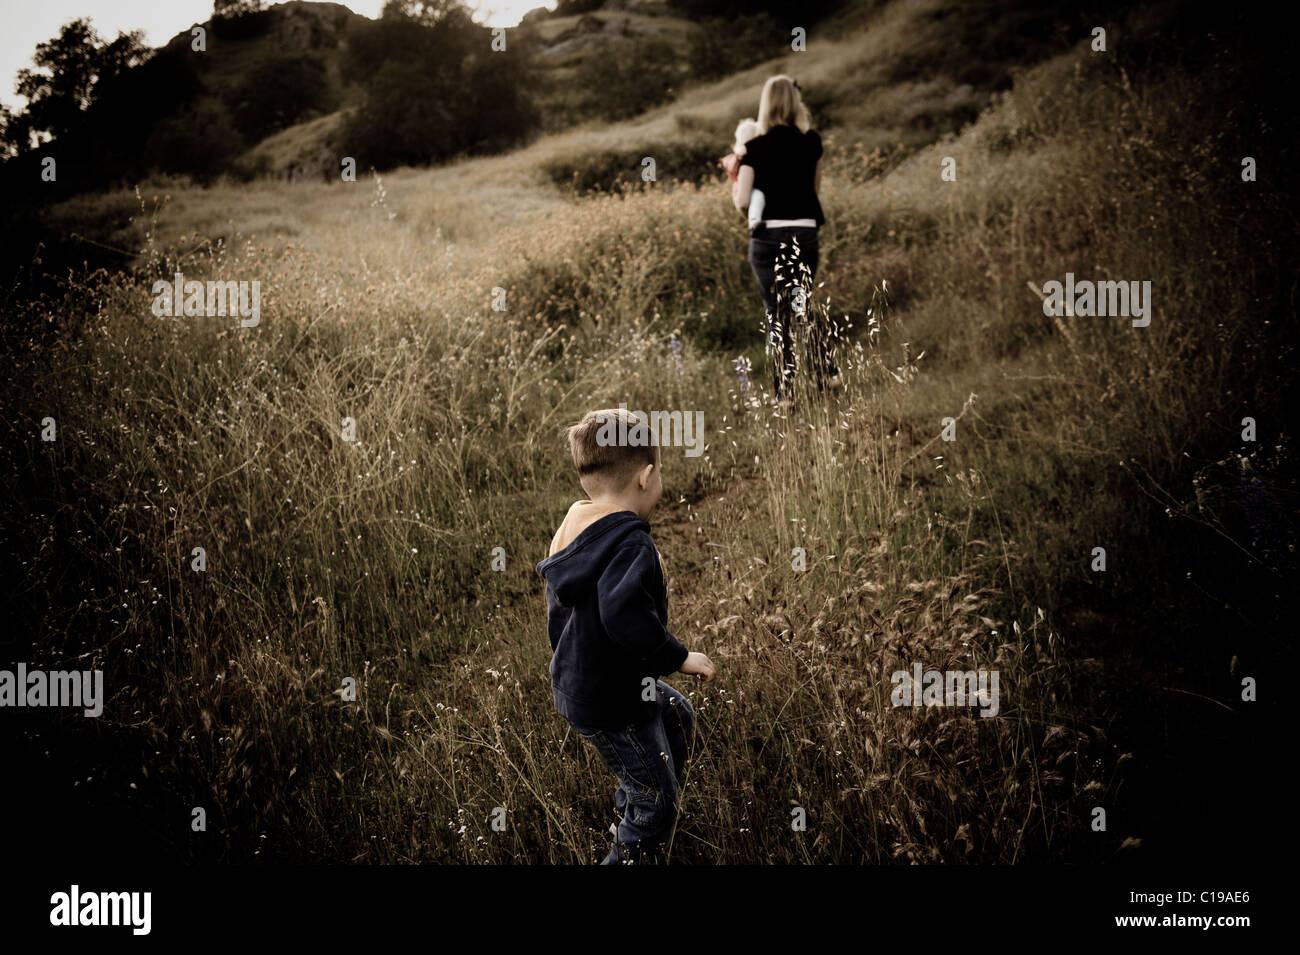 A little boy follows his mother through tell grass. - Stock Image